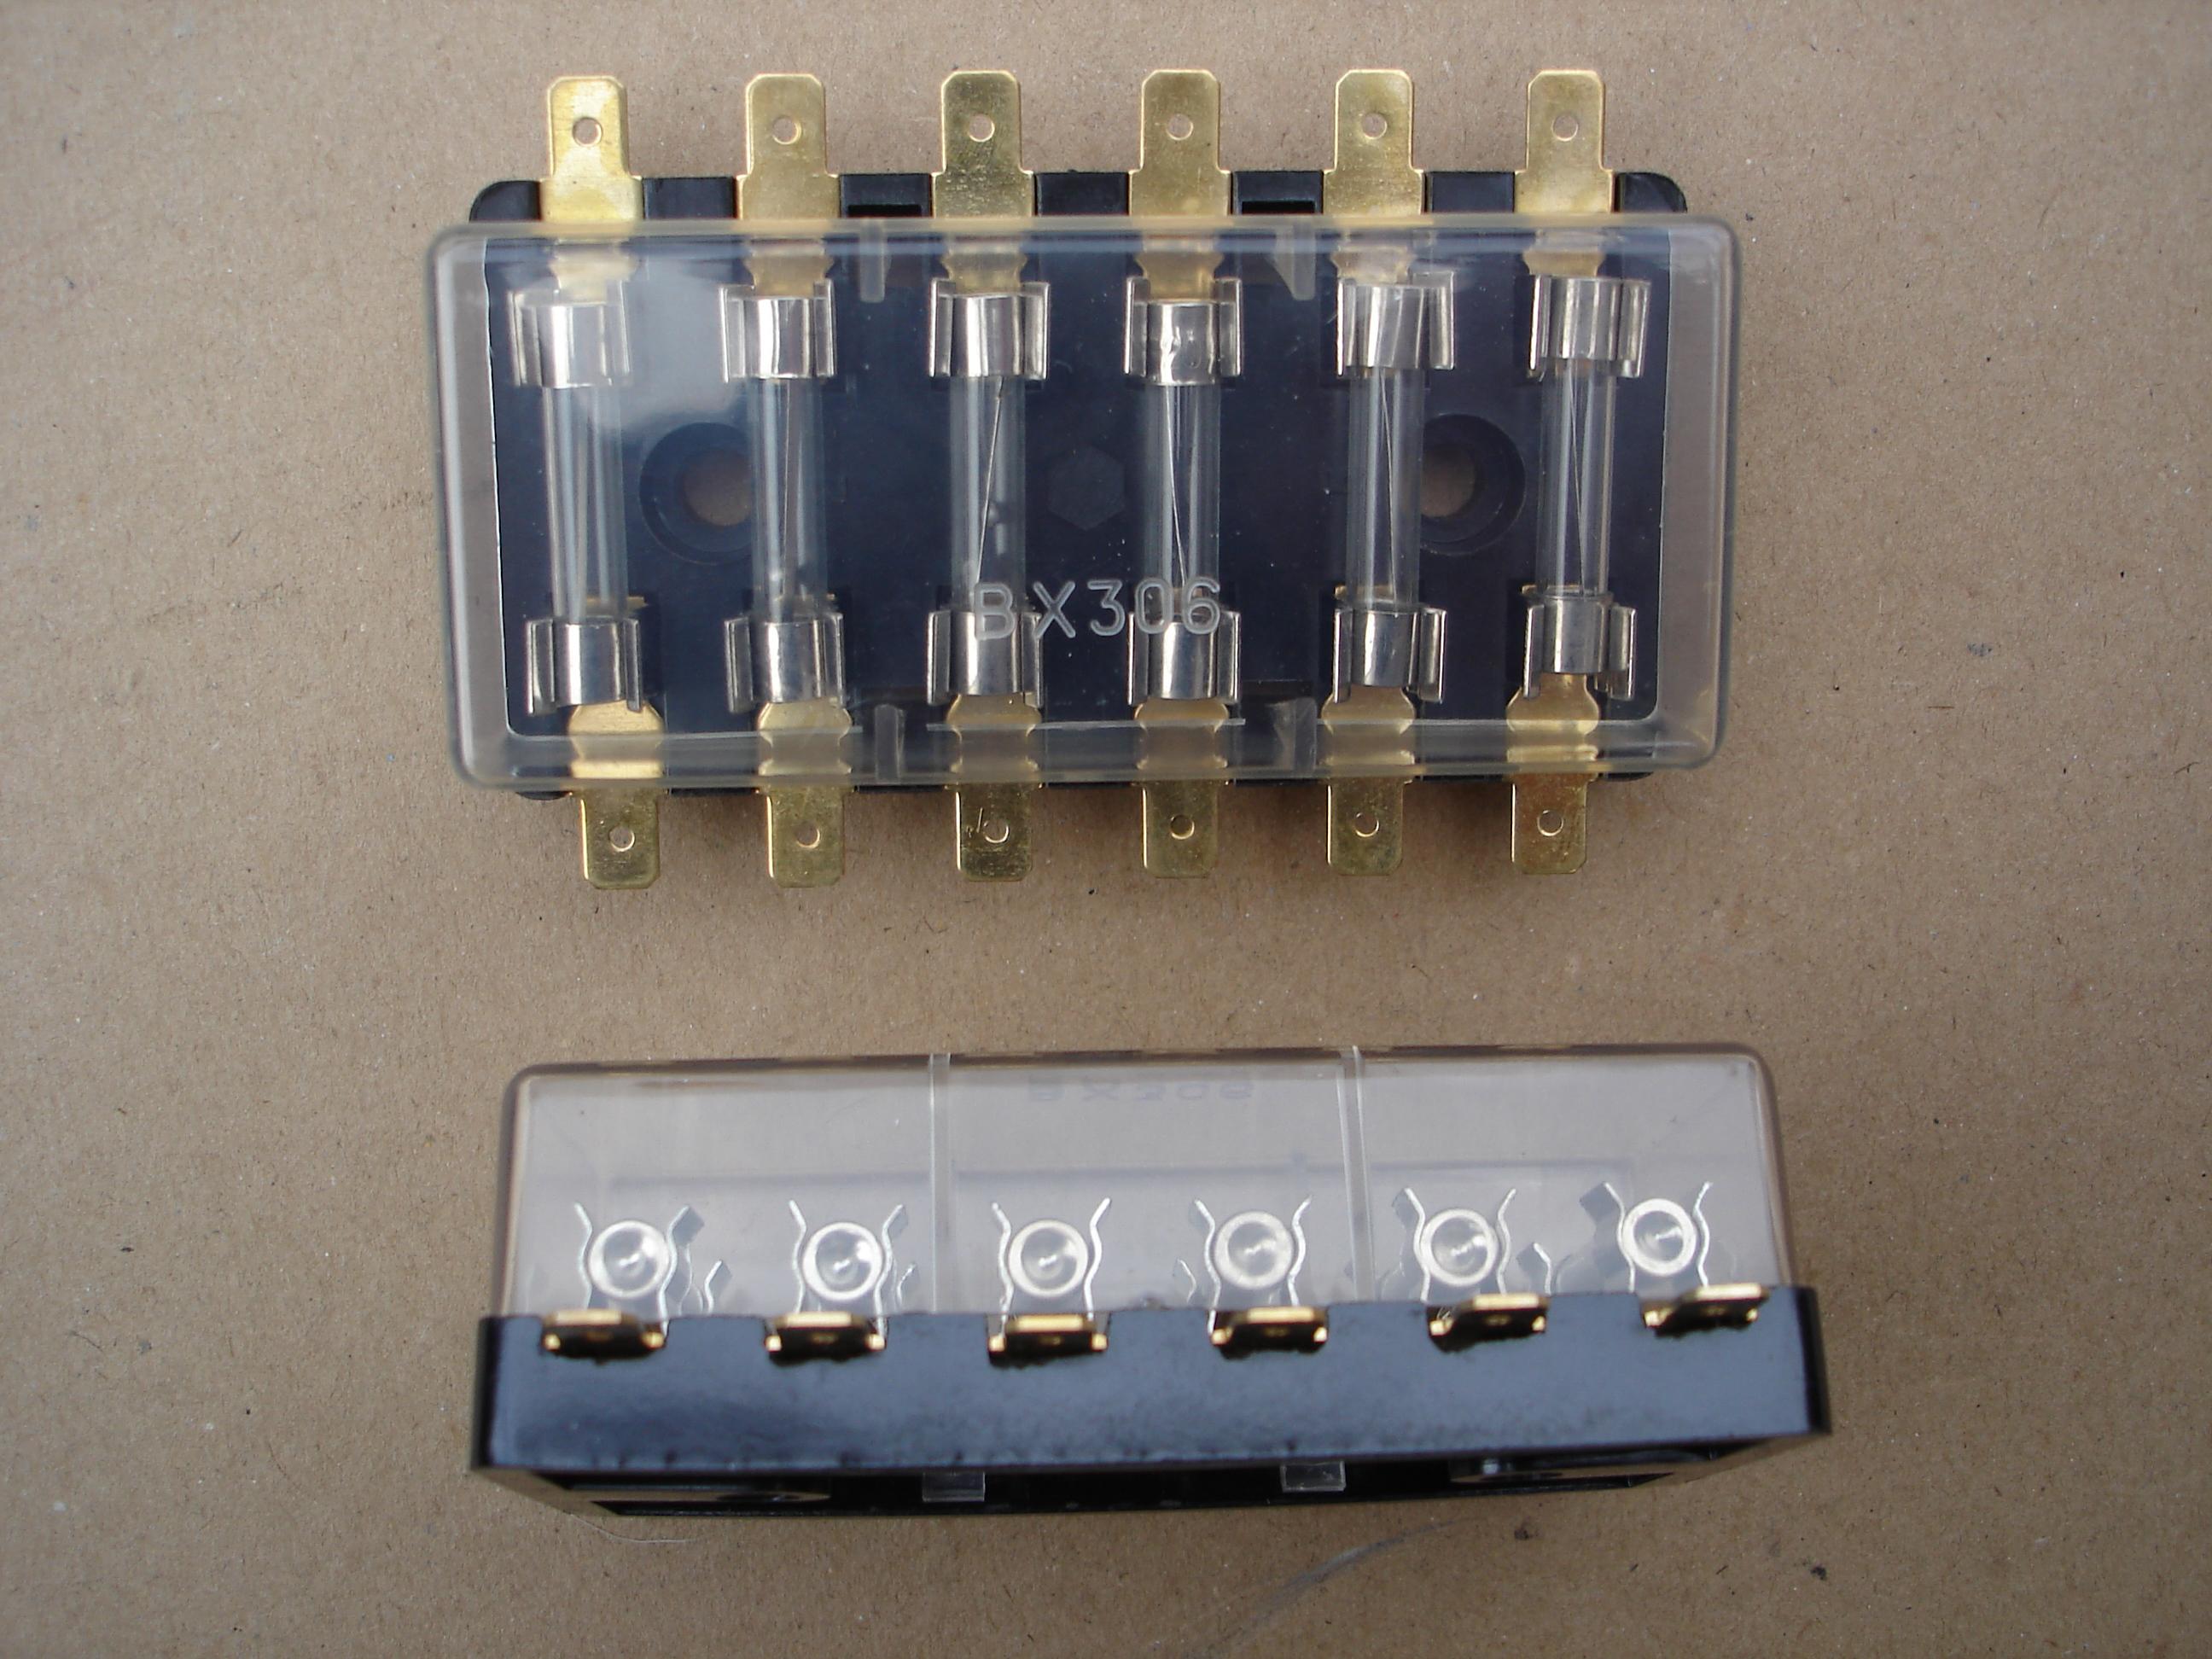 classic fuse box  takes 6 glass fuses, lucar crimp terminals  transparent  perspex clip on cover  measures 94mm x 44mm x 28mm